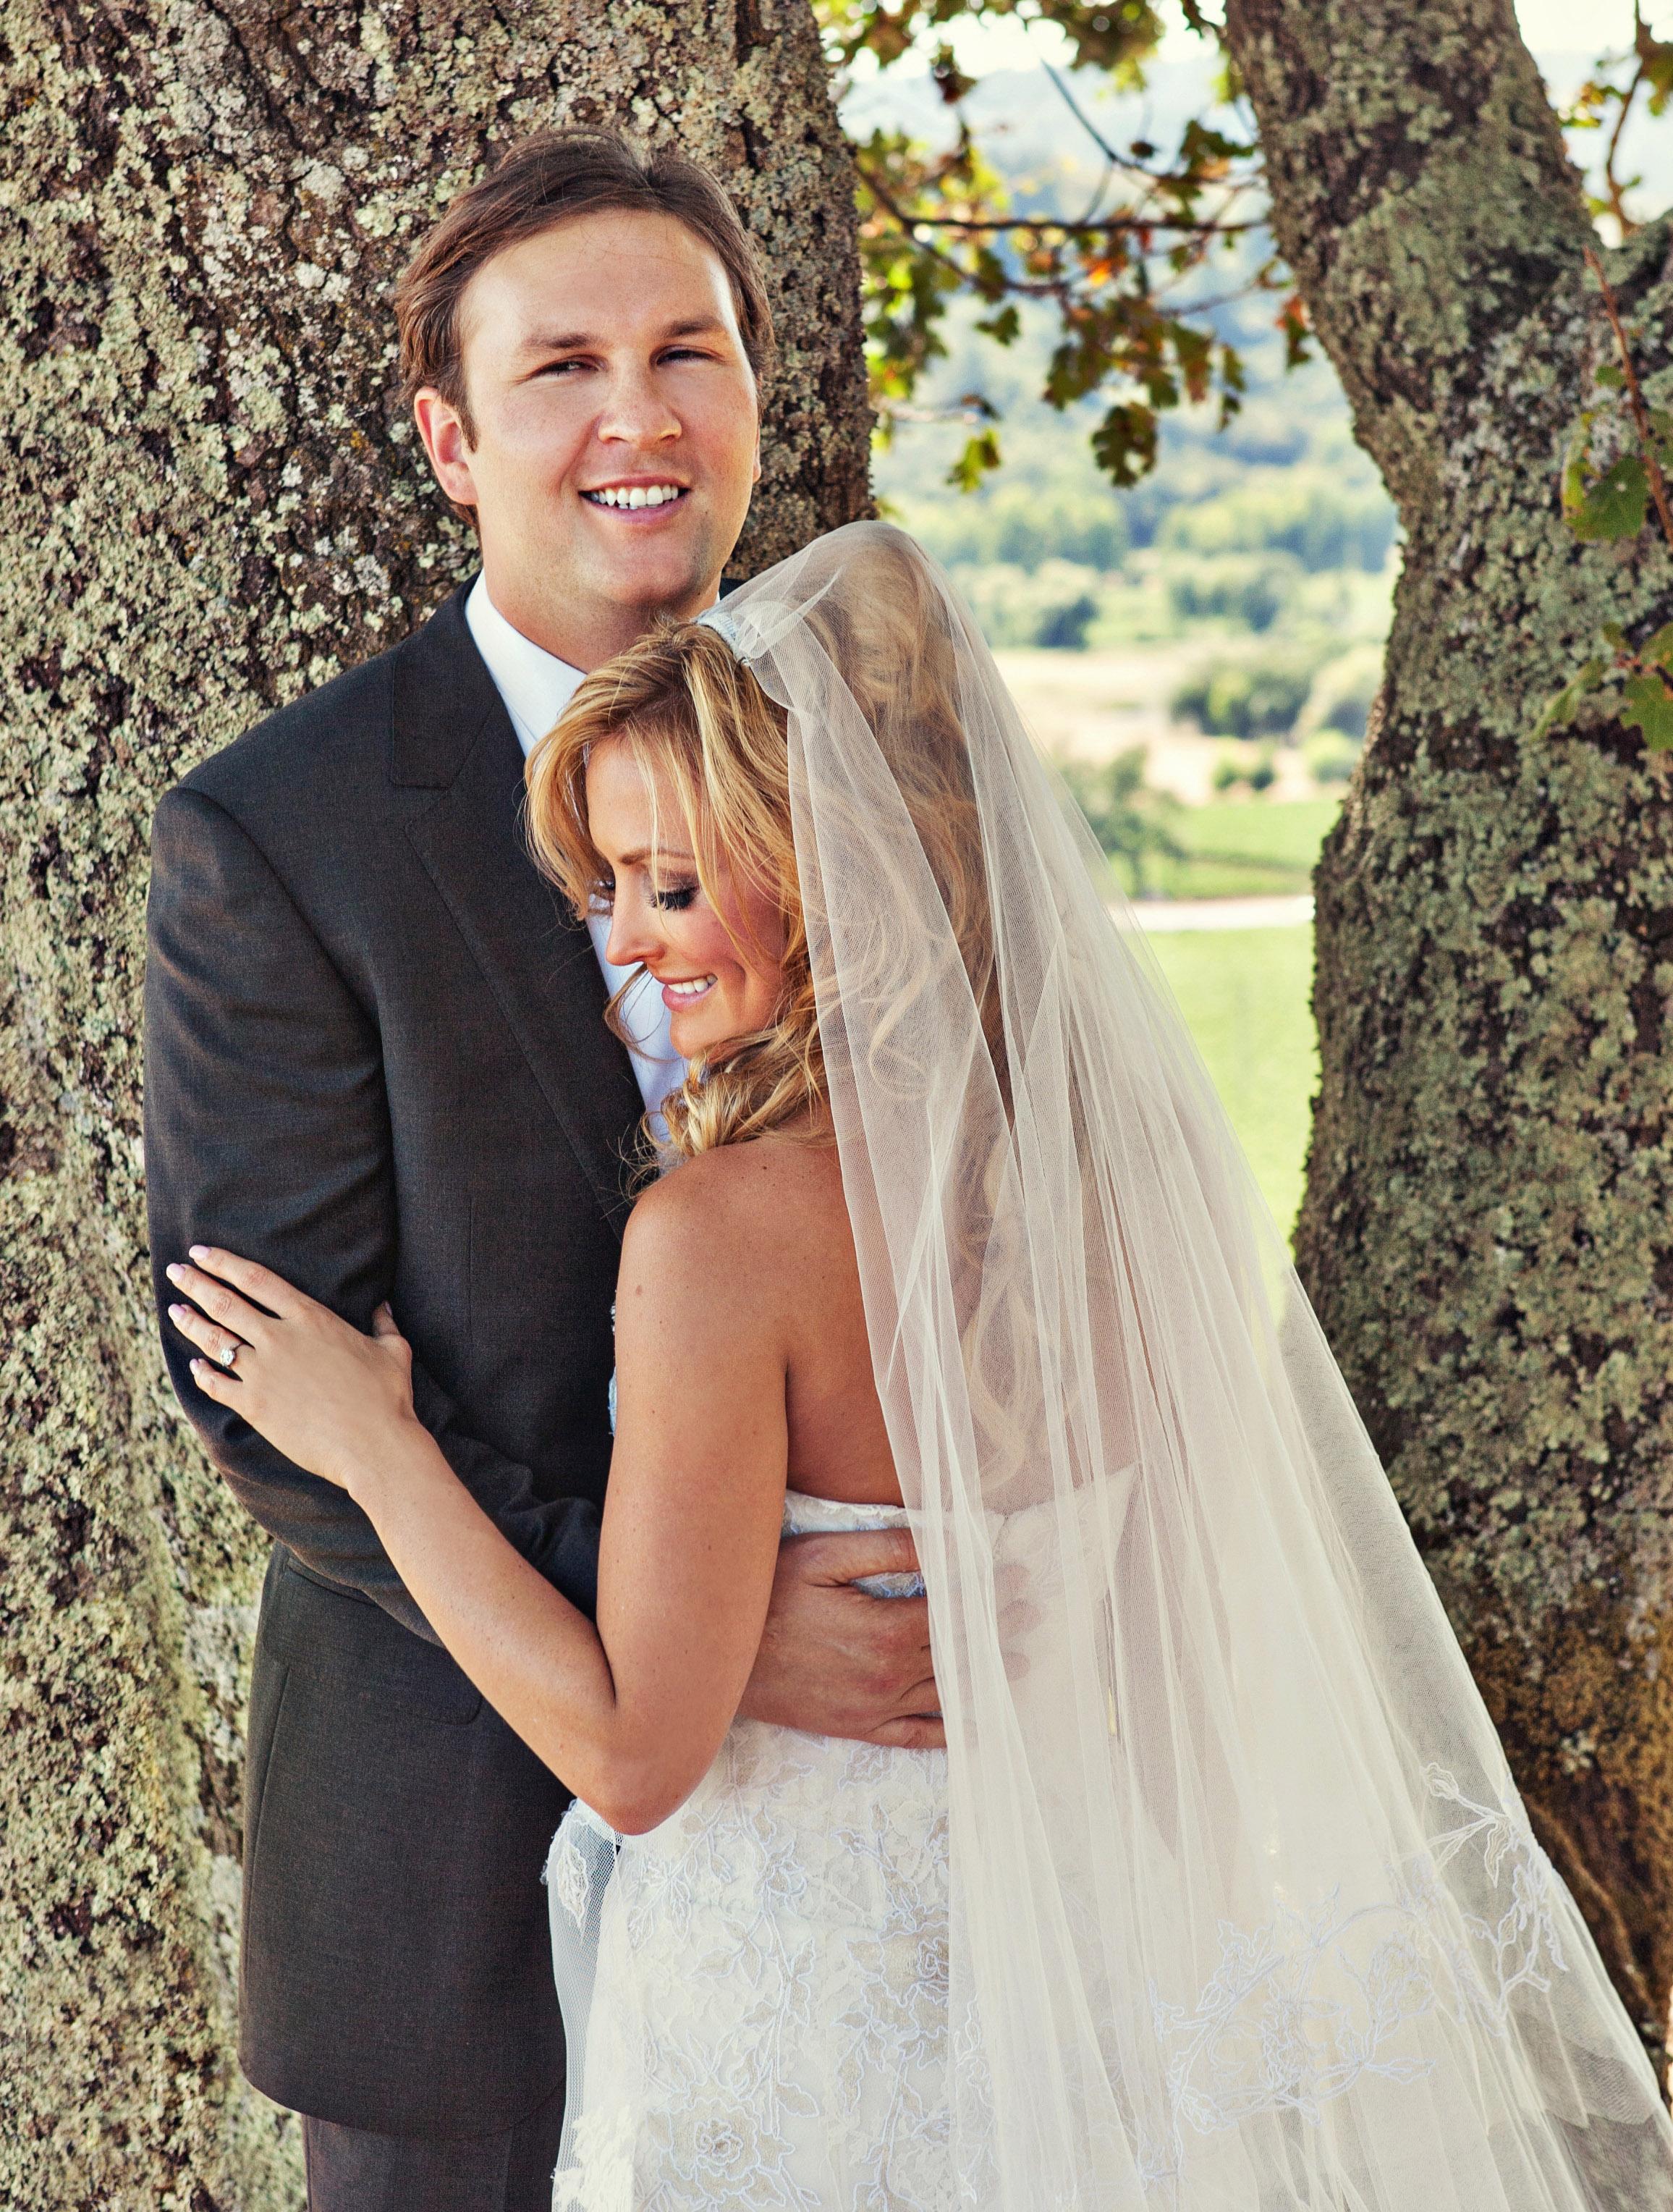 64. LS - napa wedding, vineyard ceremony, bride & groom artsy shot, summer wedding, rustic wedding, .jpg